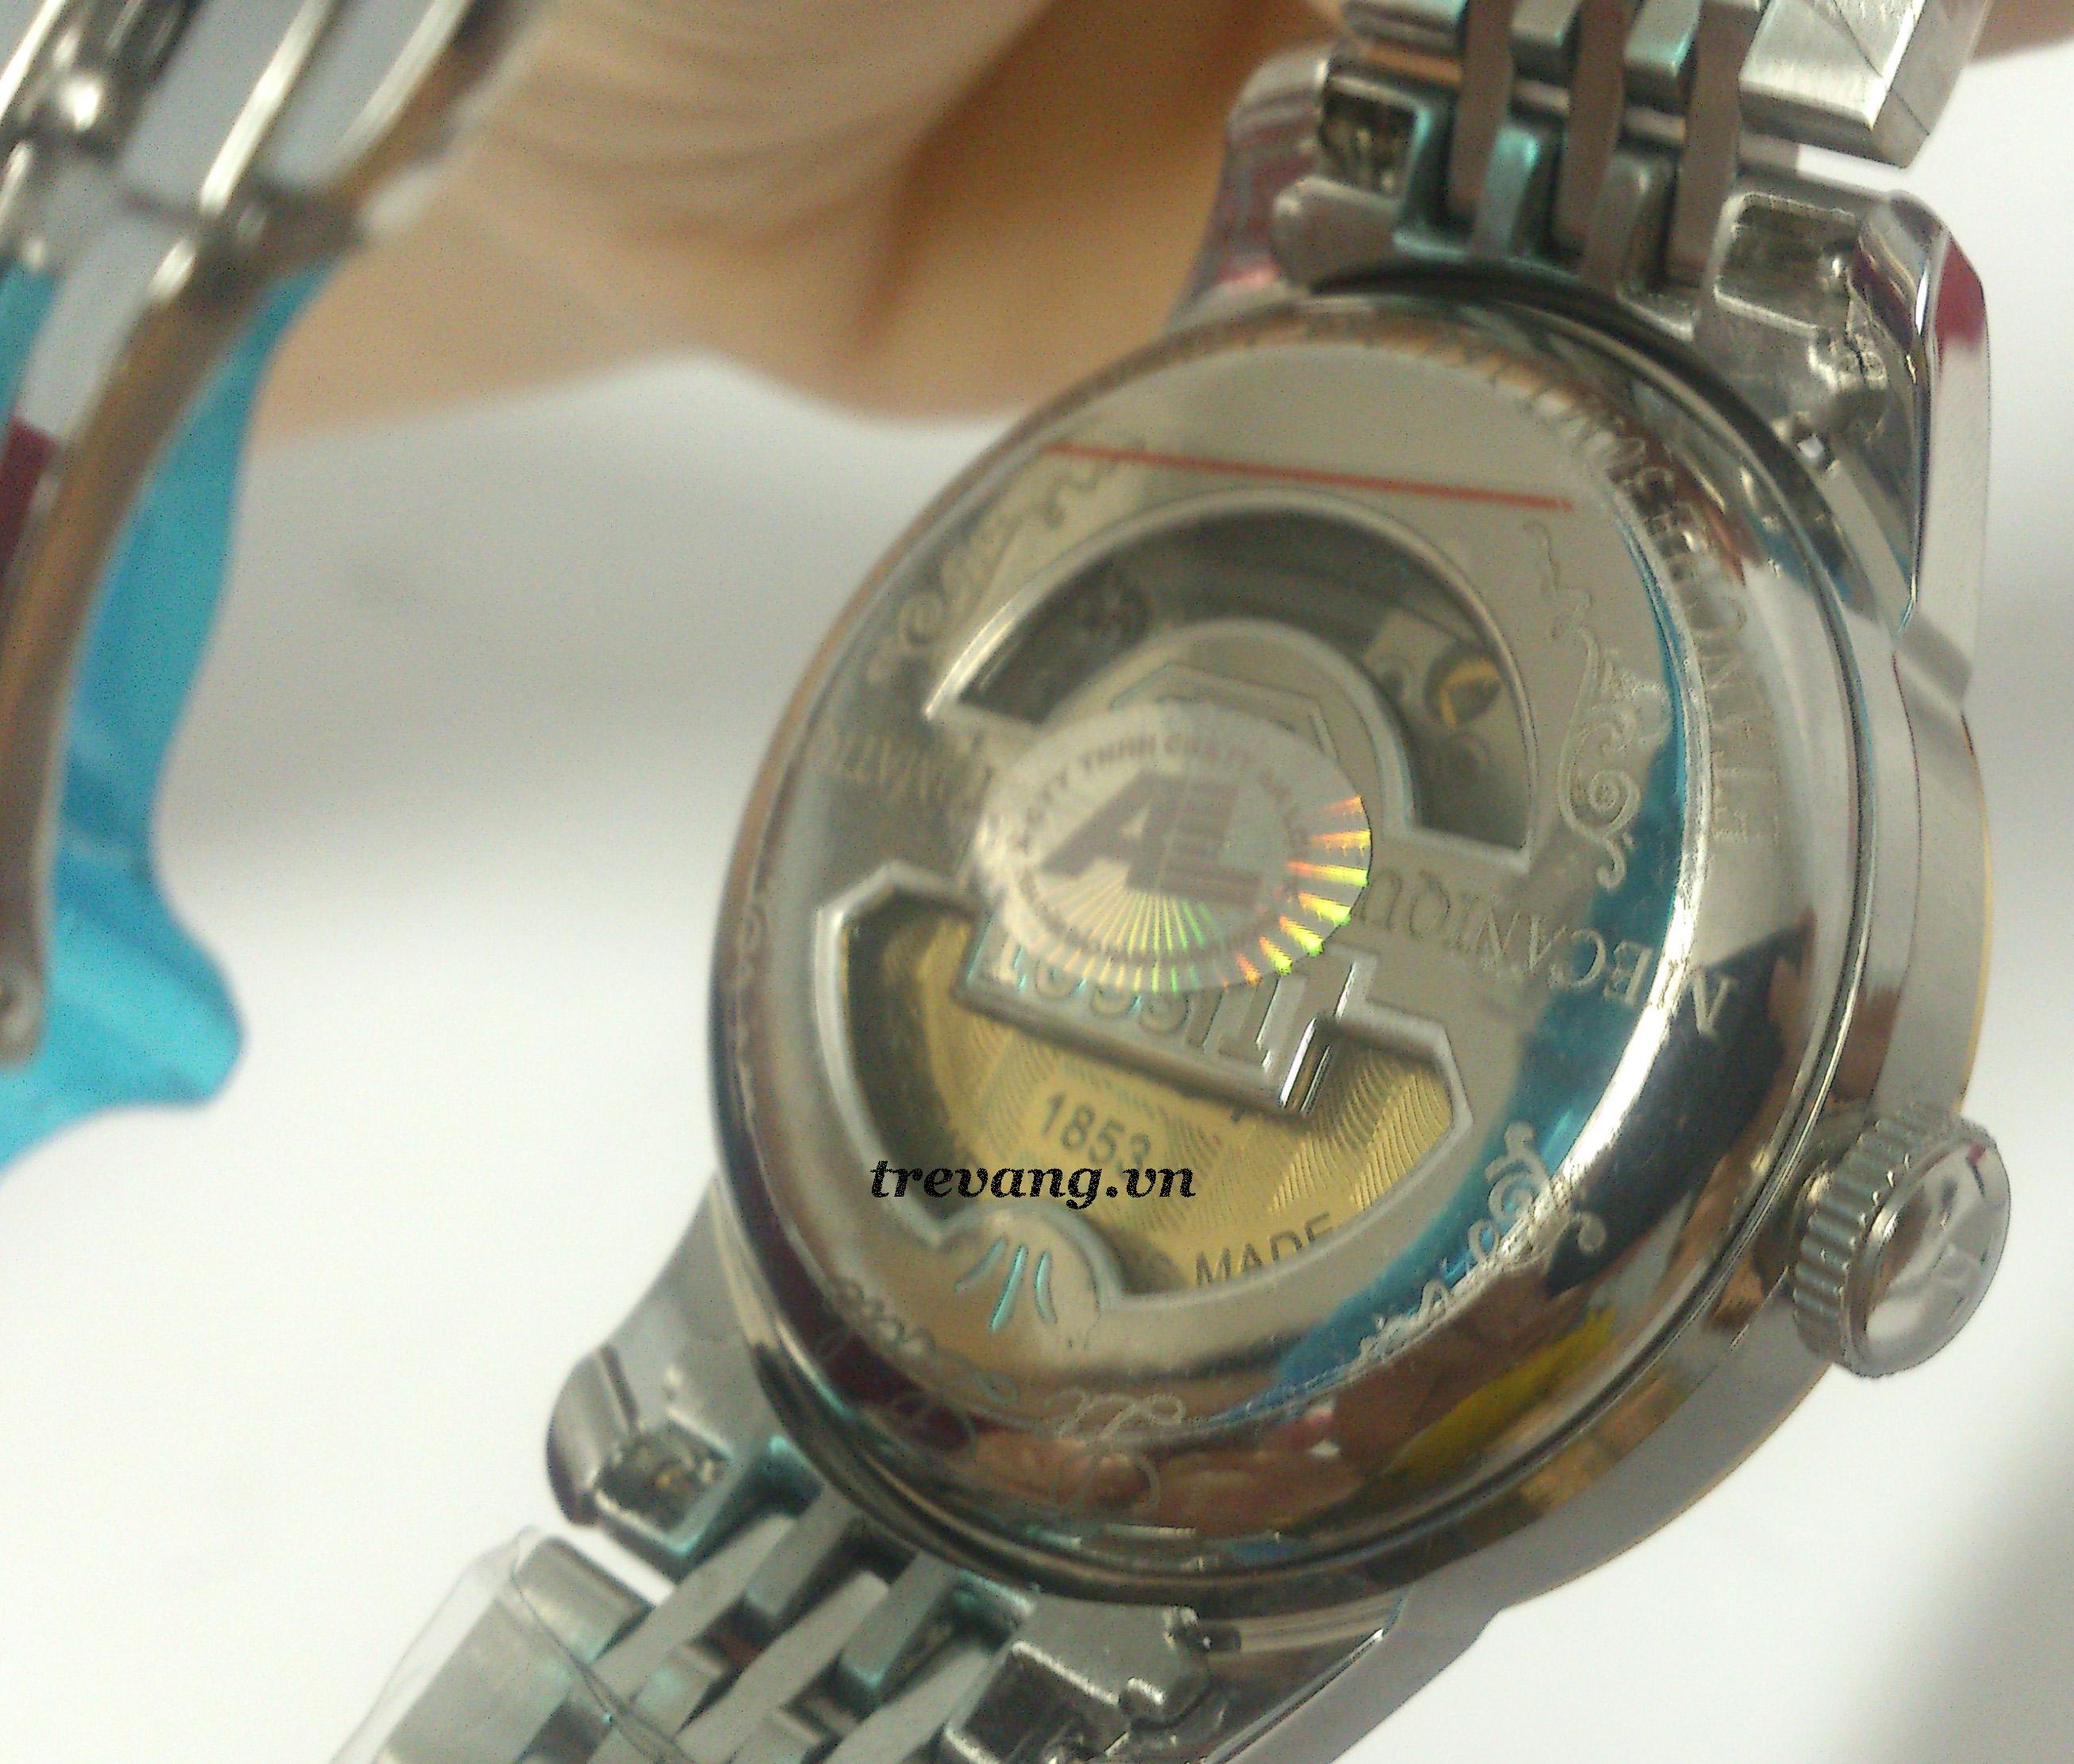 Đồng hồ Tissot 1853 12BL04472 thiết kế mặt sau tinh tế